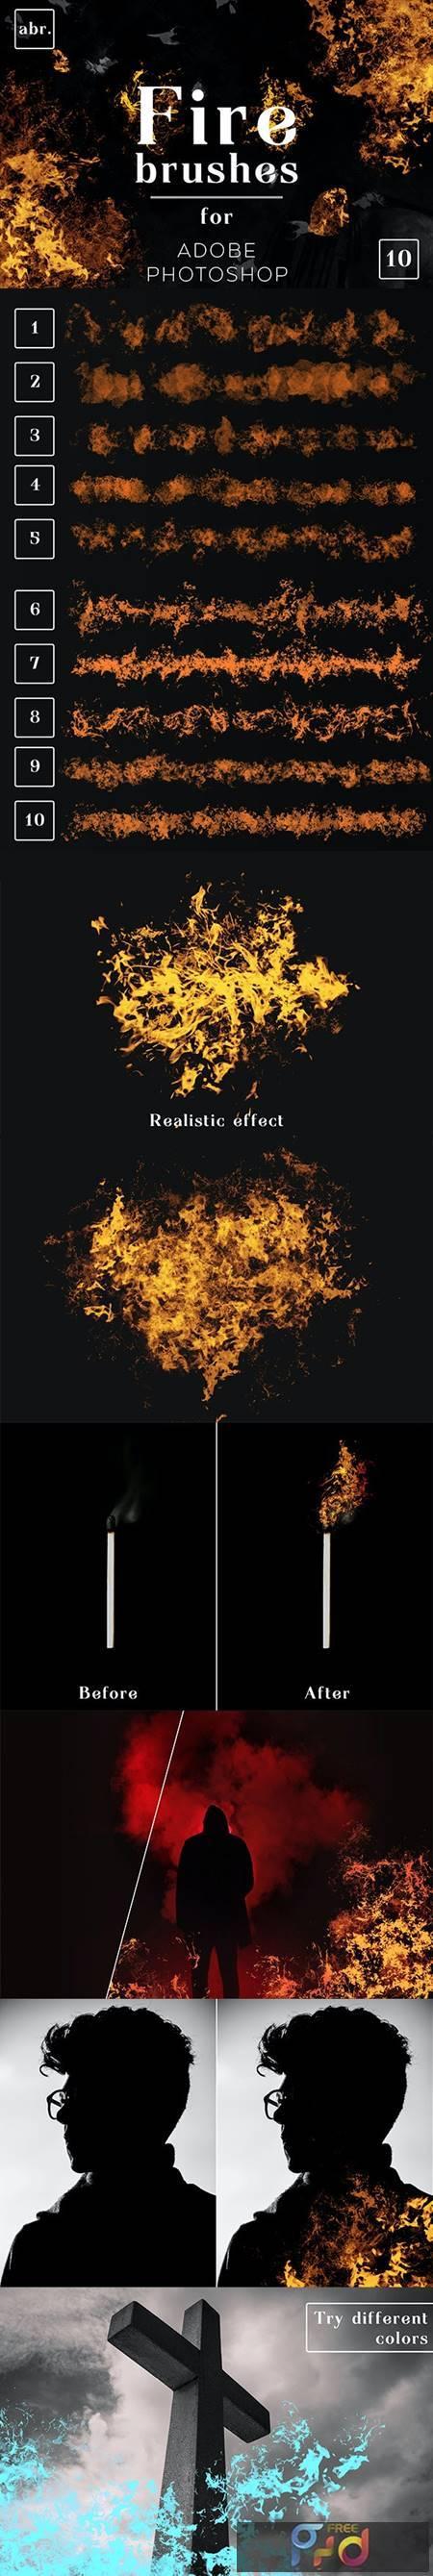 Fire Photoshop Brushes 26427935 1